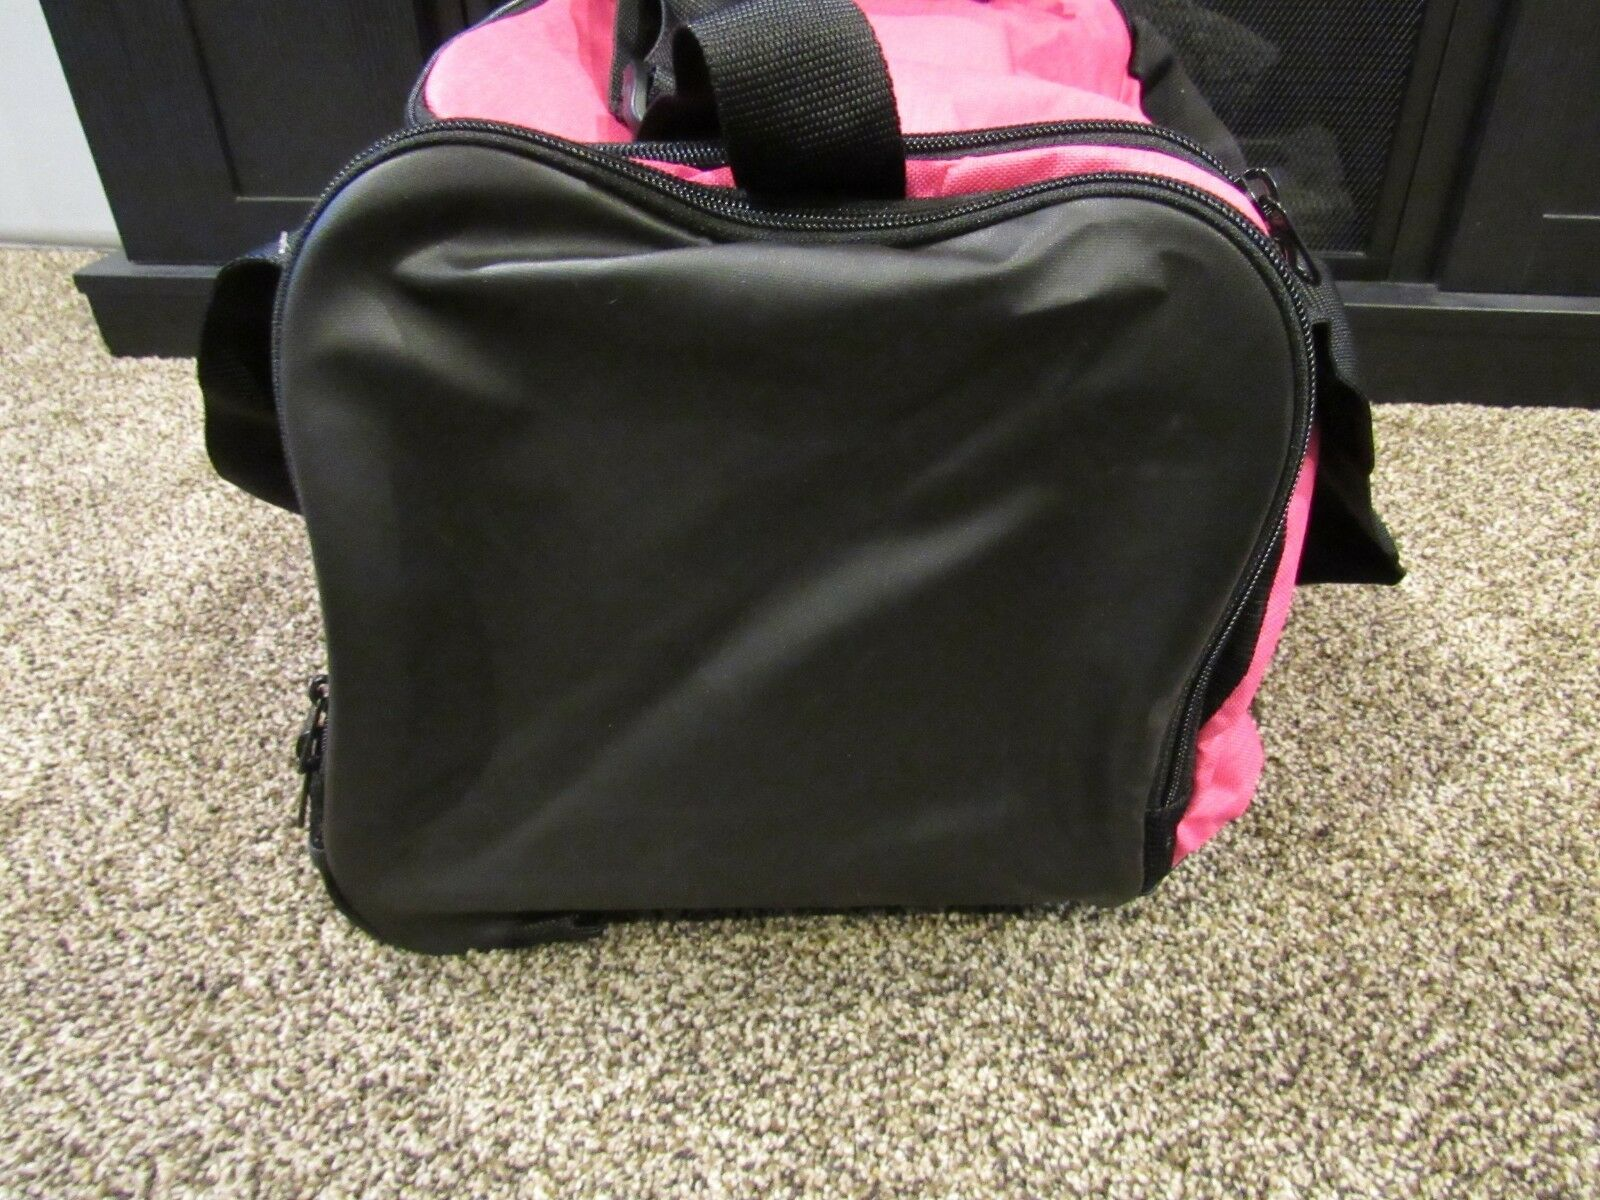 ccd13f5b582405 Nike Brasilla Small Duffel Bag Ba5335 616 for sale online | eBay